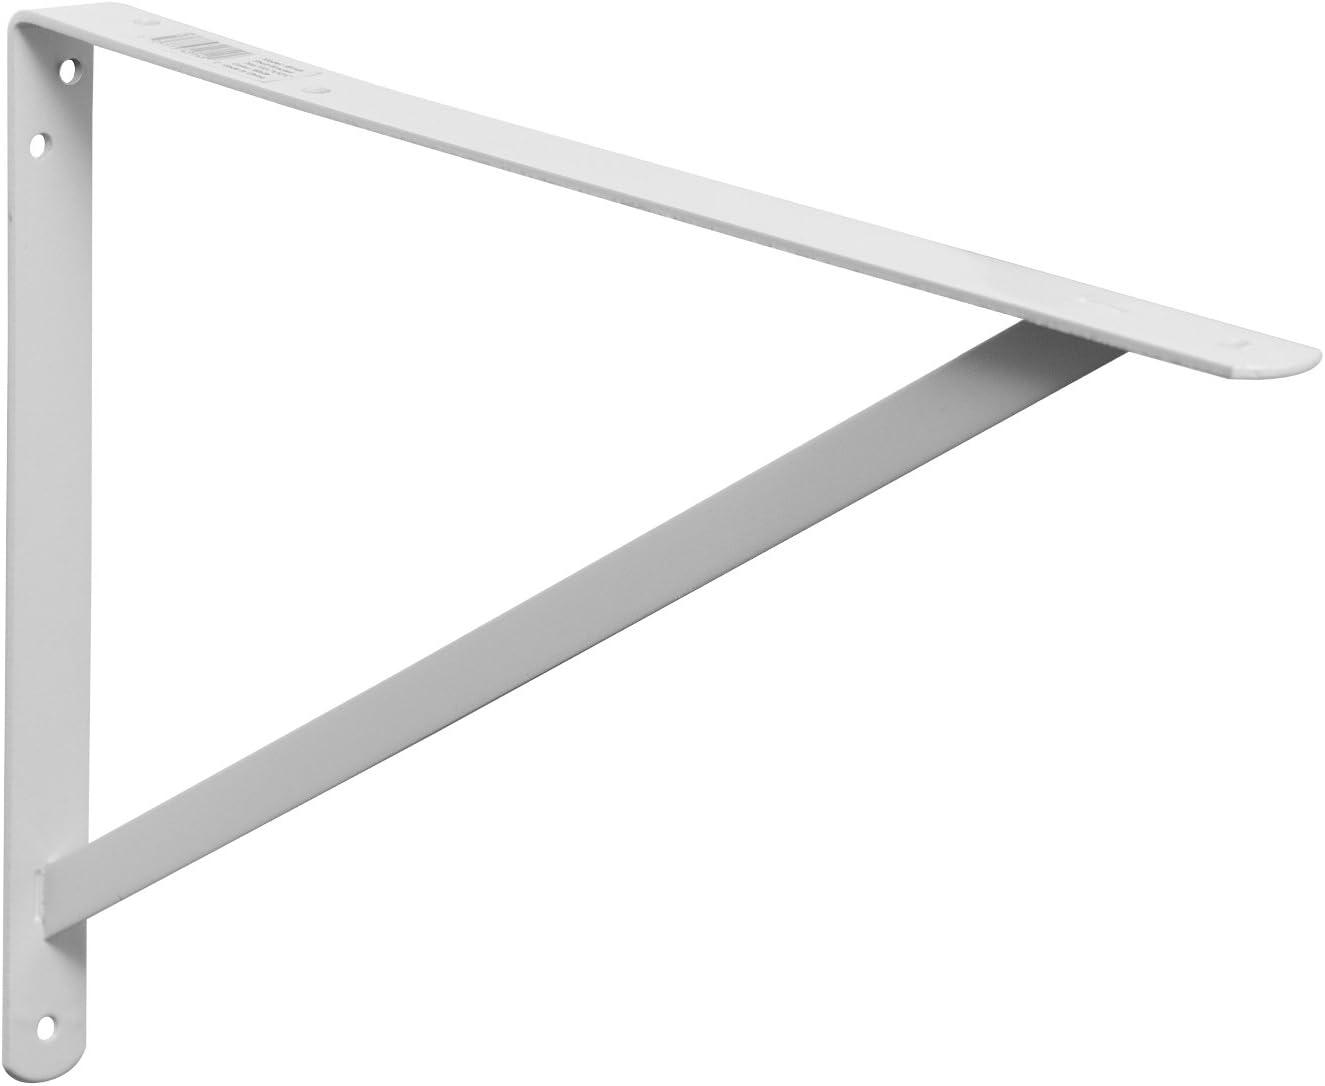 White Decko 49149 Heavy Duty Shelf Bracket 19.25-Inch by 12.50-Inch 10-Pack